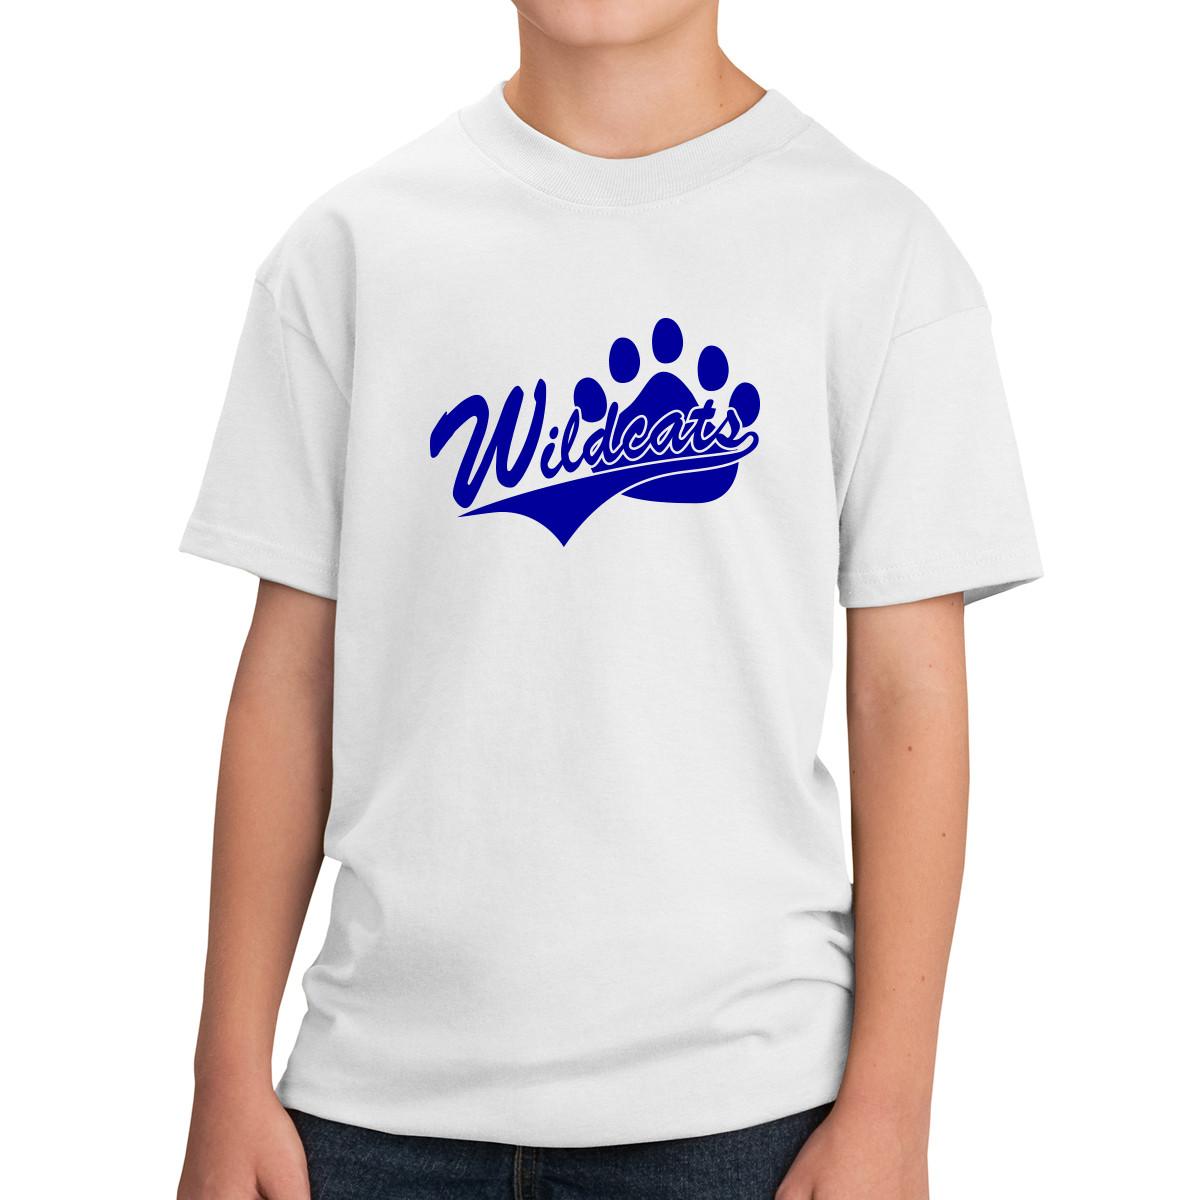 Port & Company ® Youth Core Cotton T-Shirt